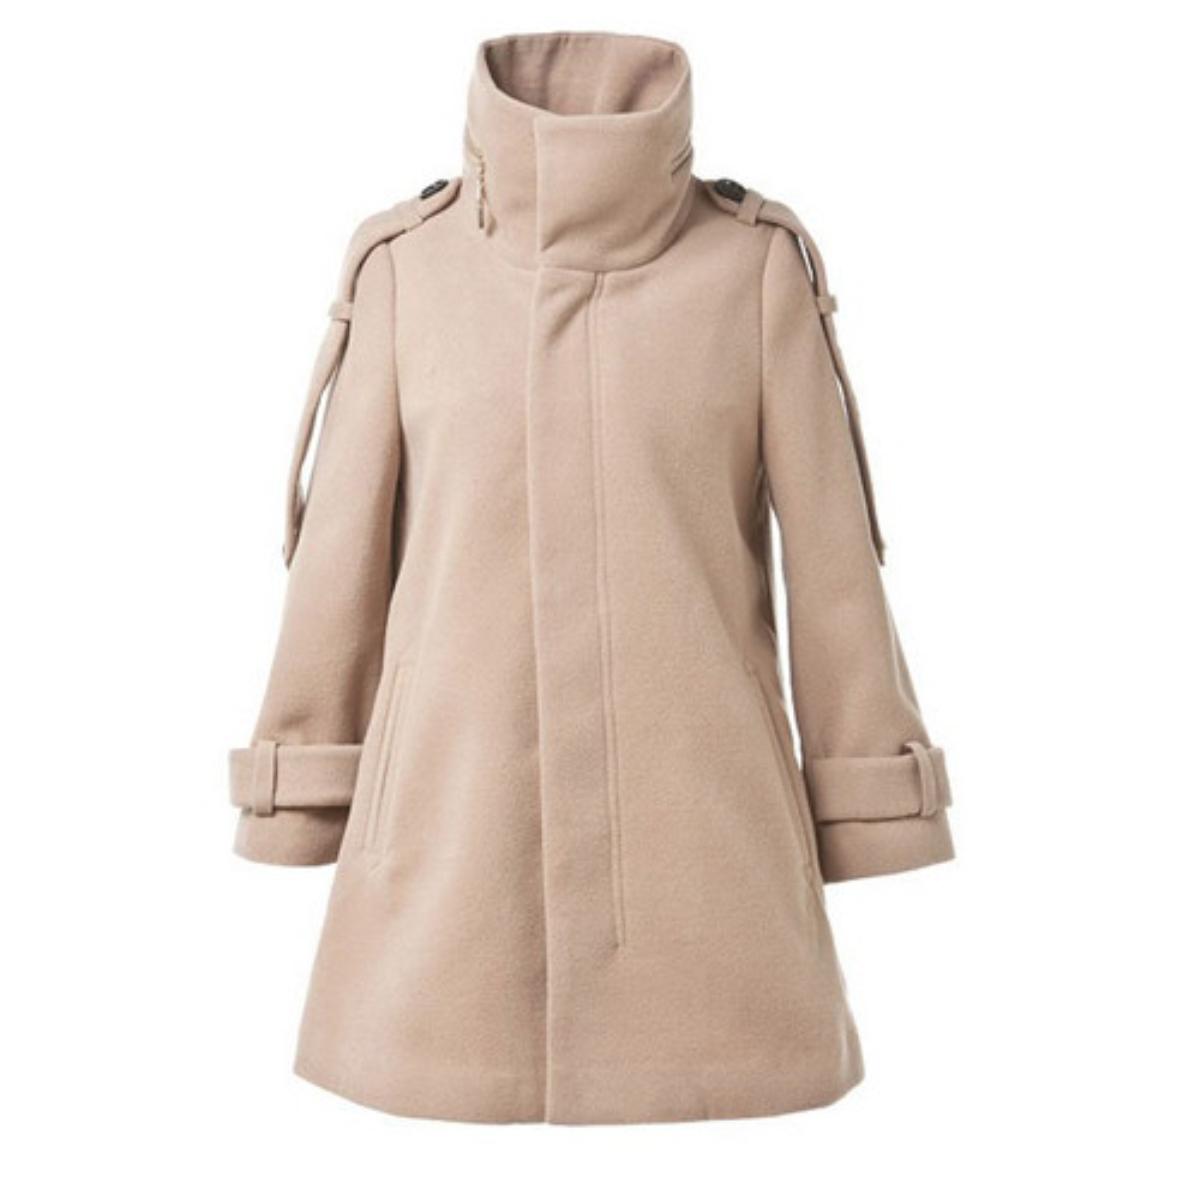 Stand Collar Three Quarter Sleeve Woolen Coat,Cheap in Wendybox.com